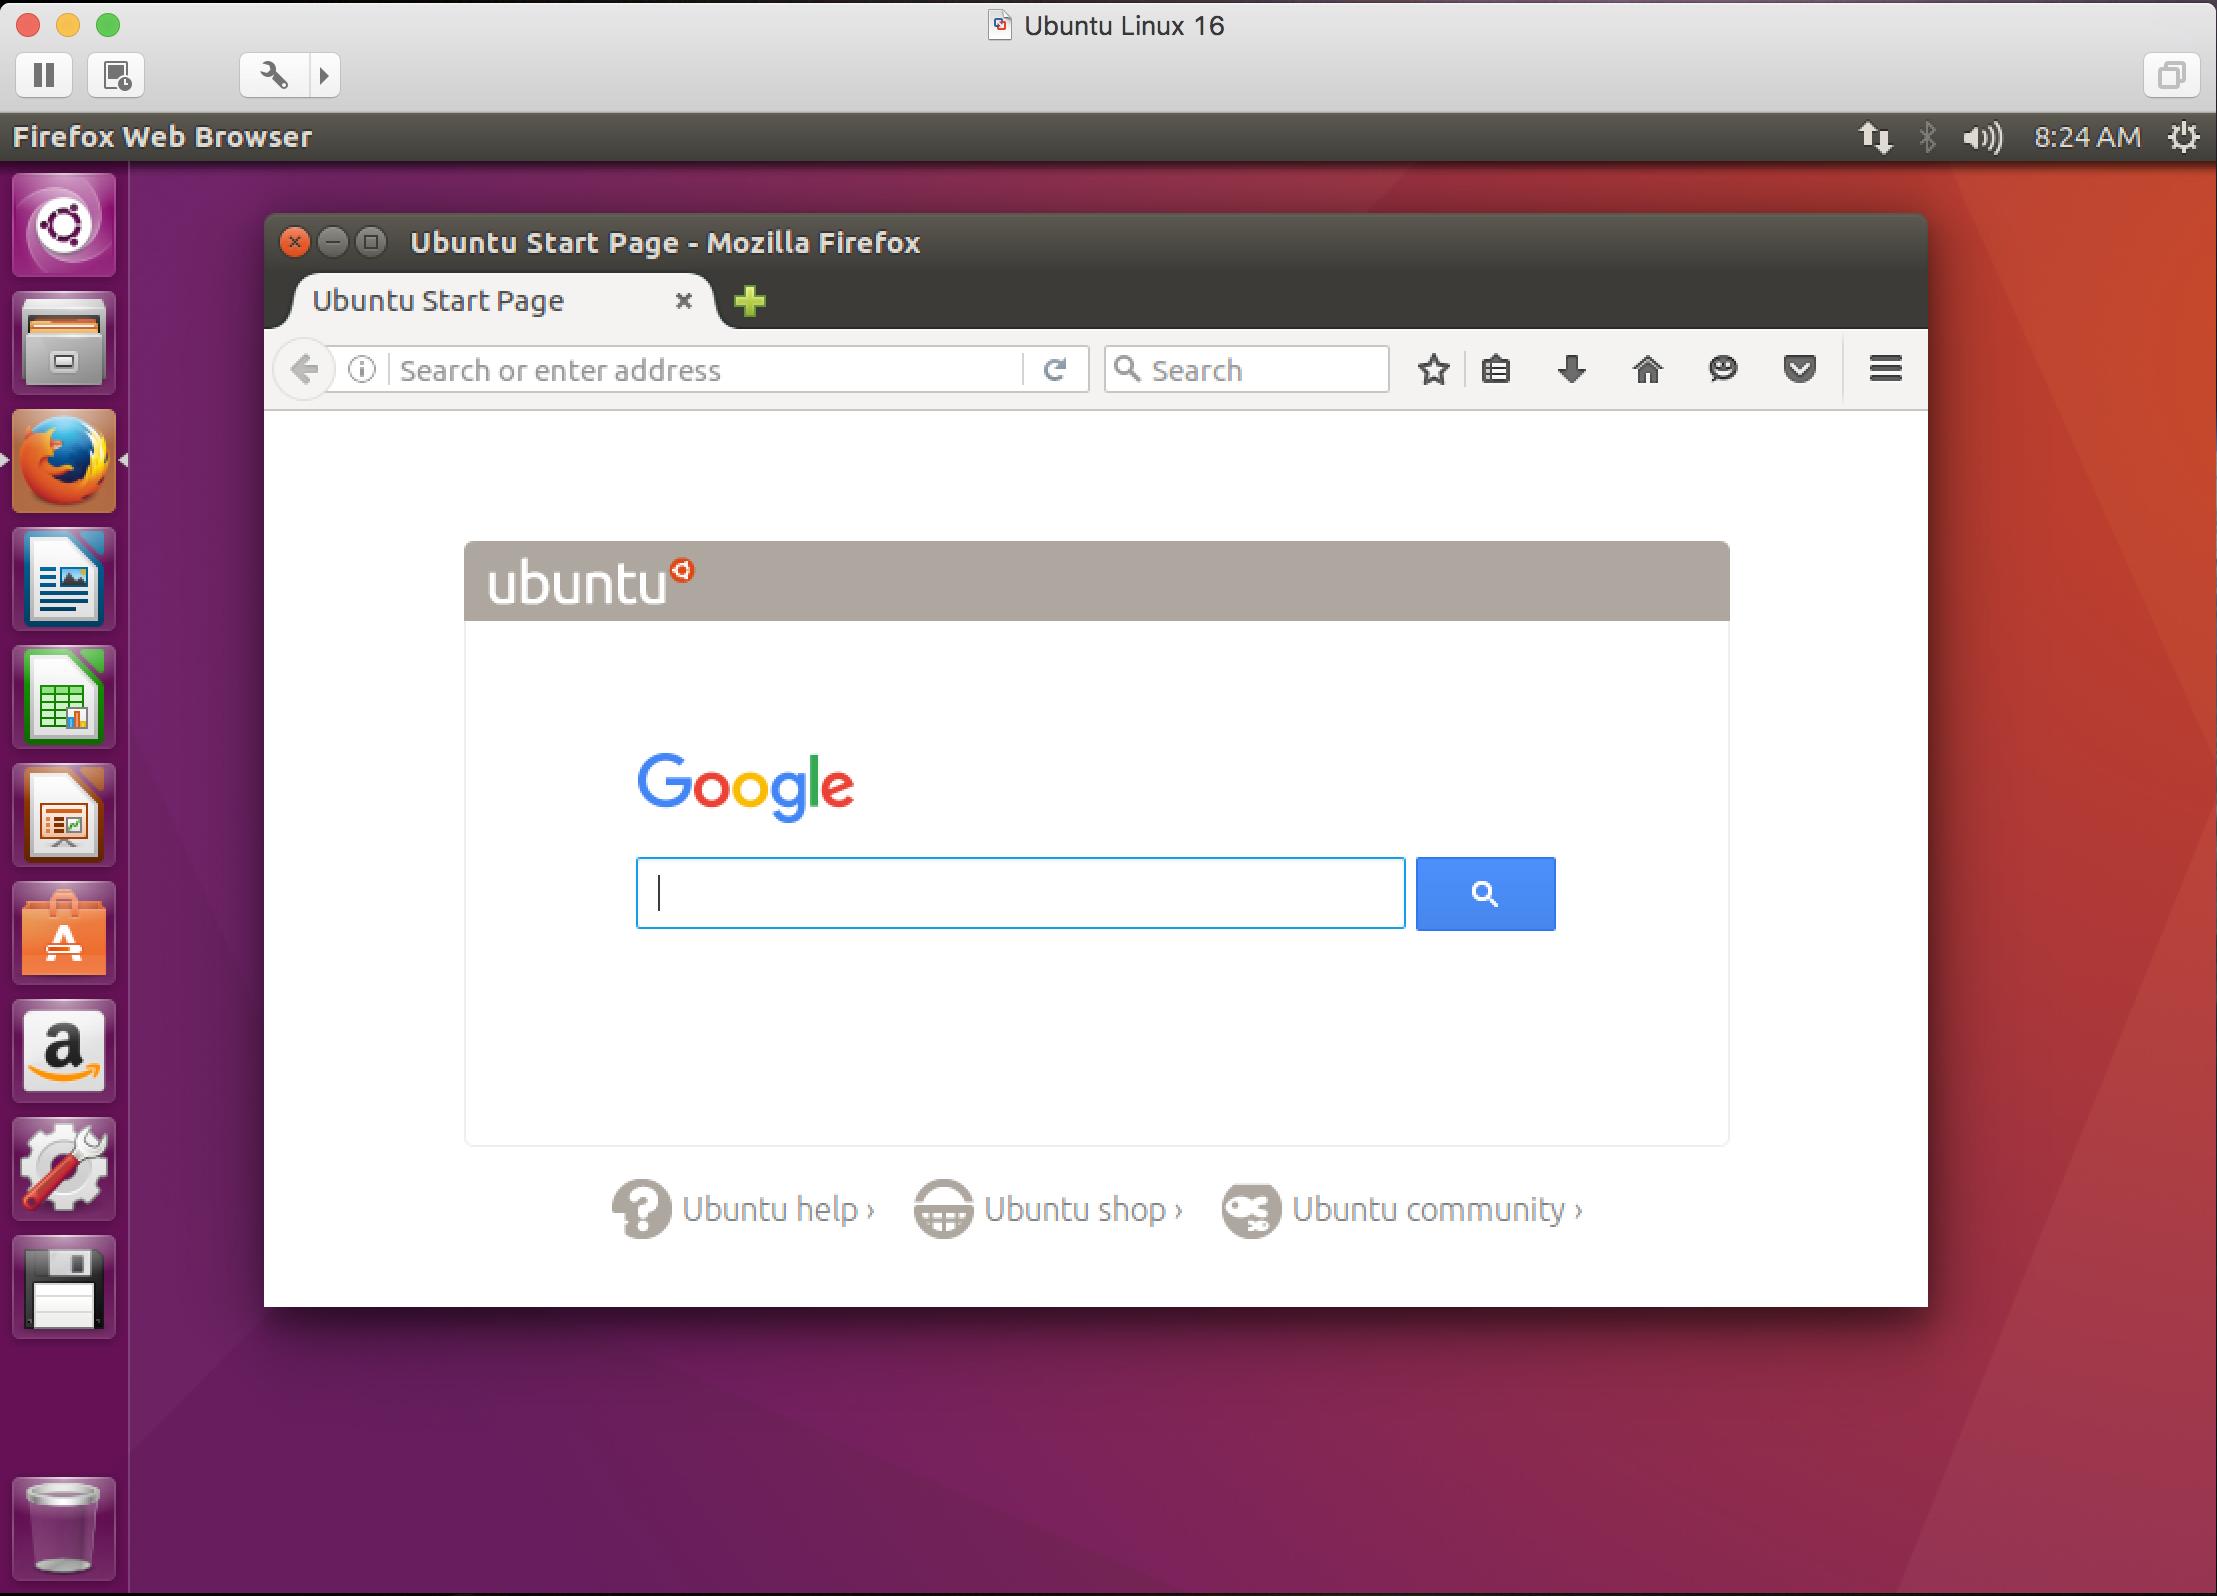 ubuntu linux w/ firefox, running in vmware fusion